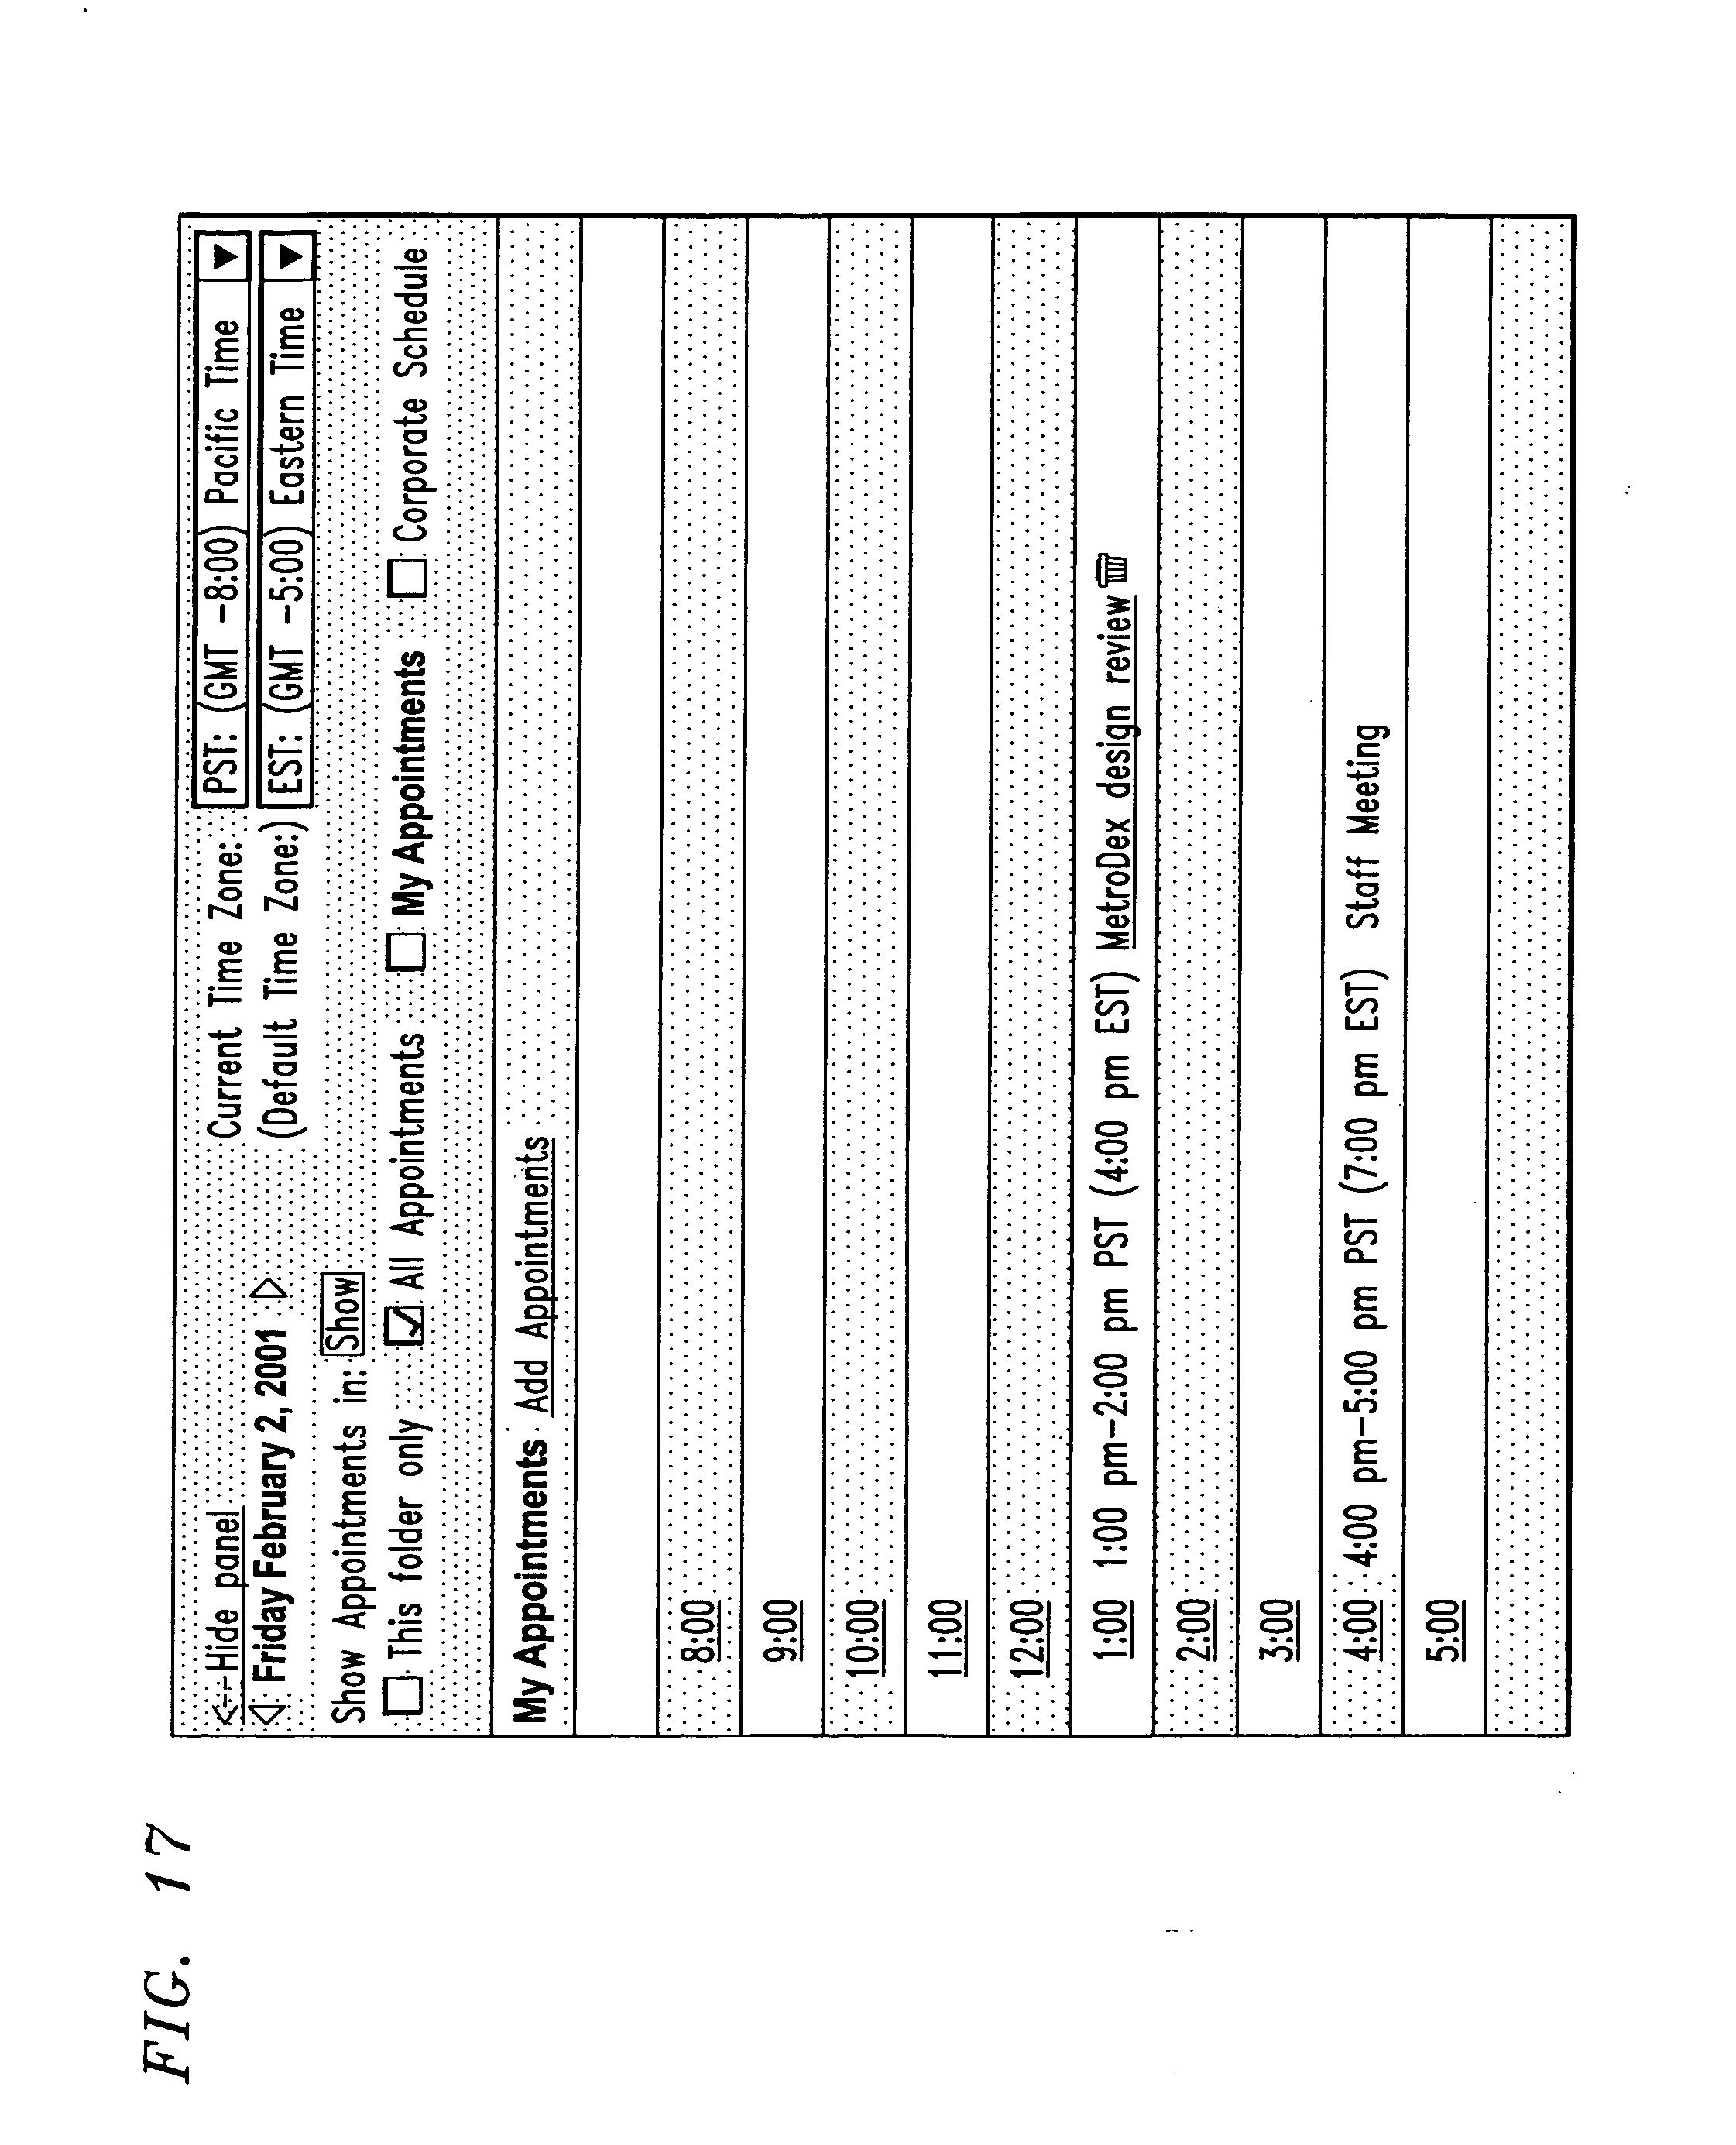 Patent US 20050002510A1